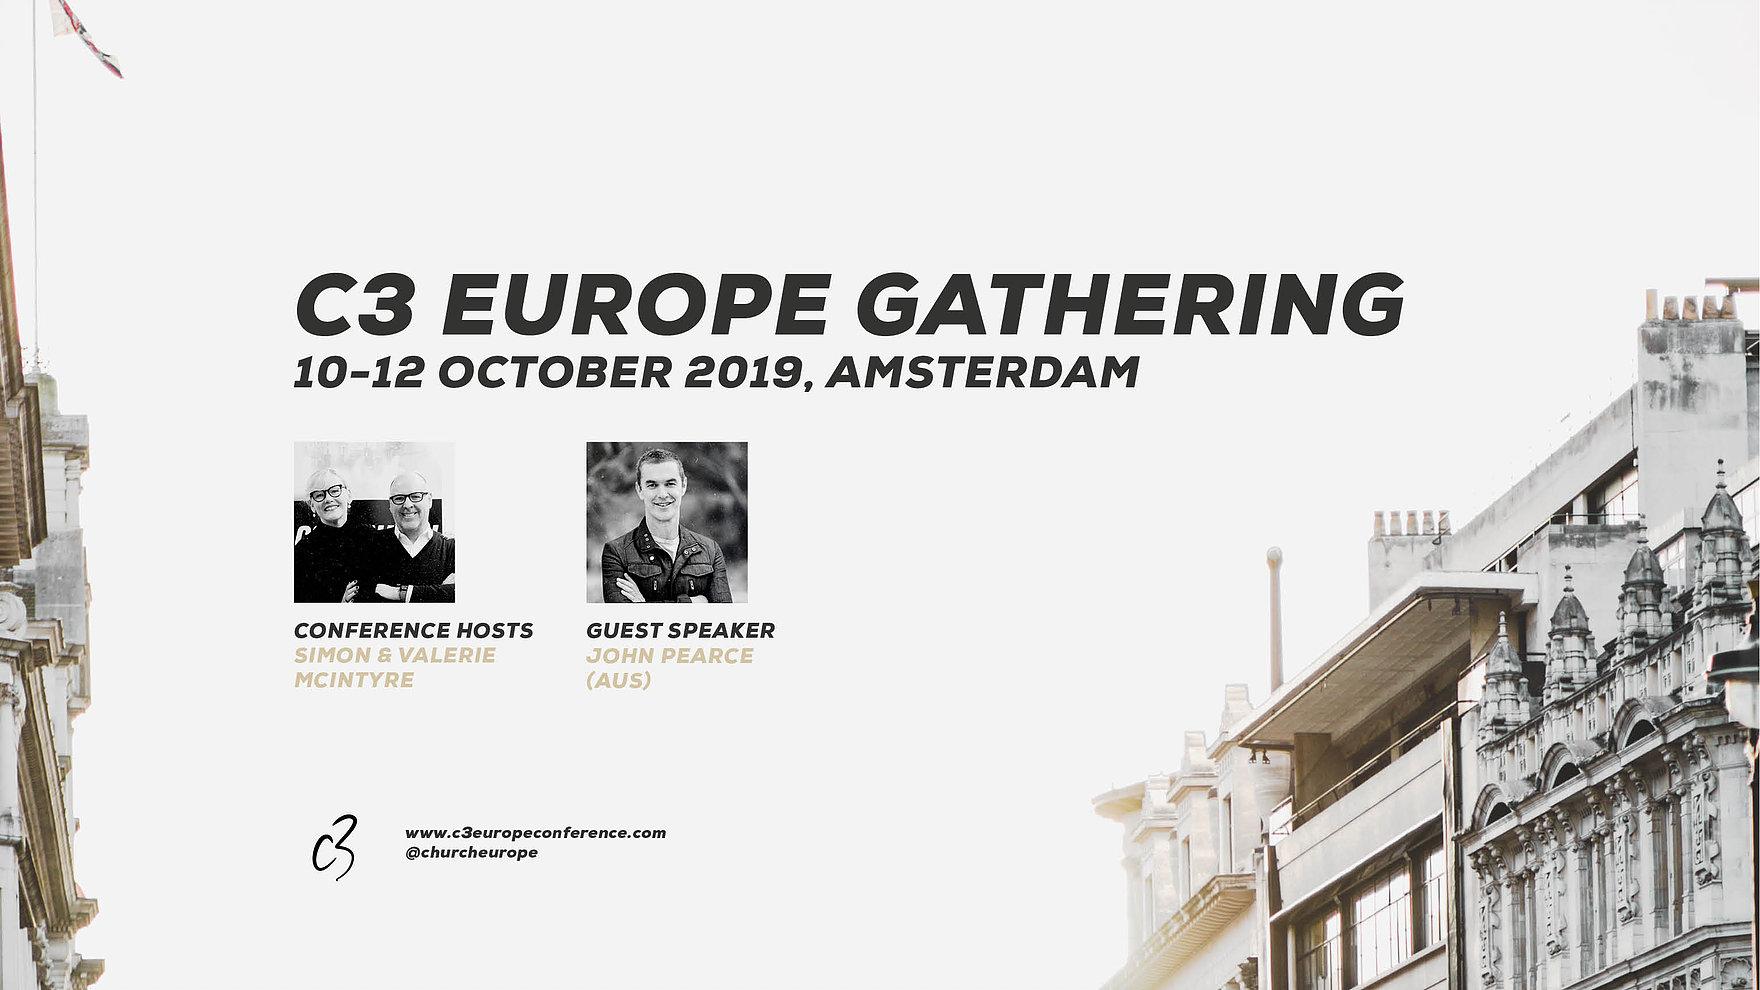 Location  Amsterdam Theater, Danzigerkade 5, 1013 AP Amsterdam, Netherlands   Register   https://www.c3europeconference.com/events/c3-europe-gathering-2019